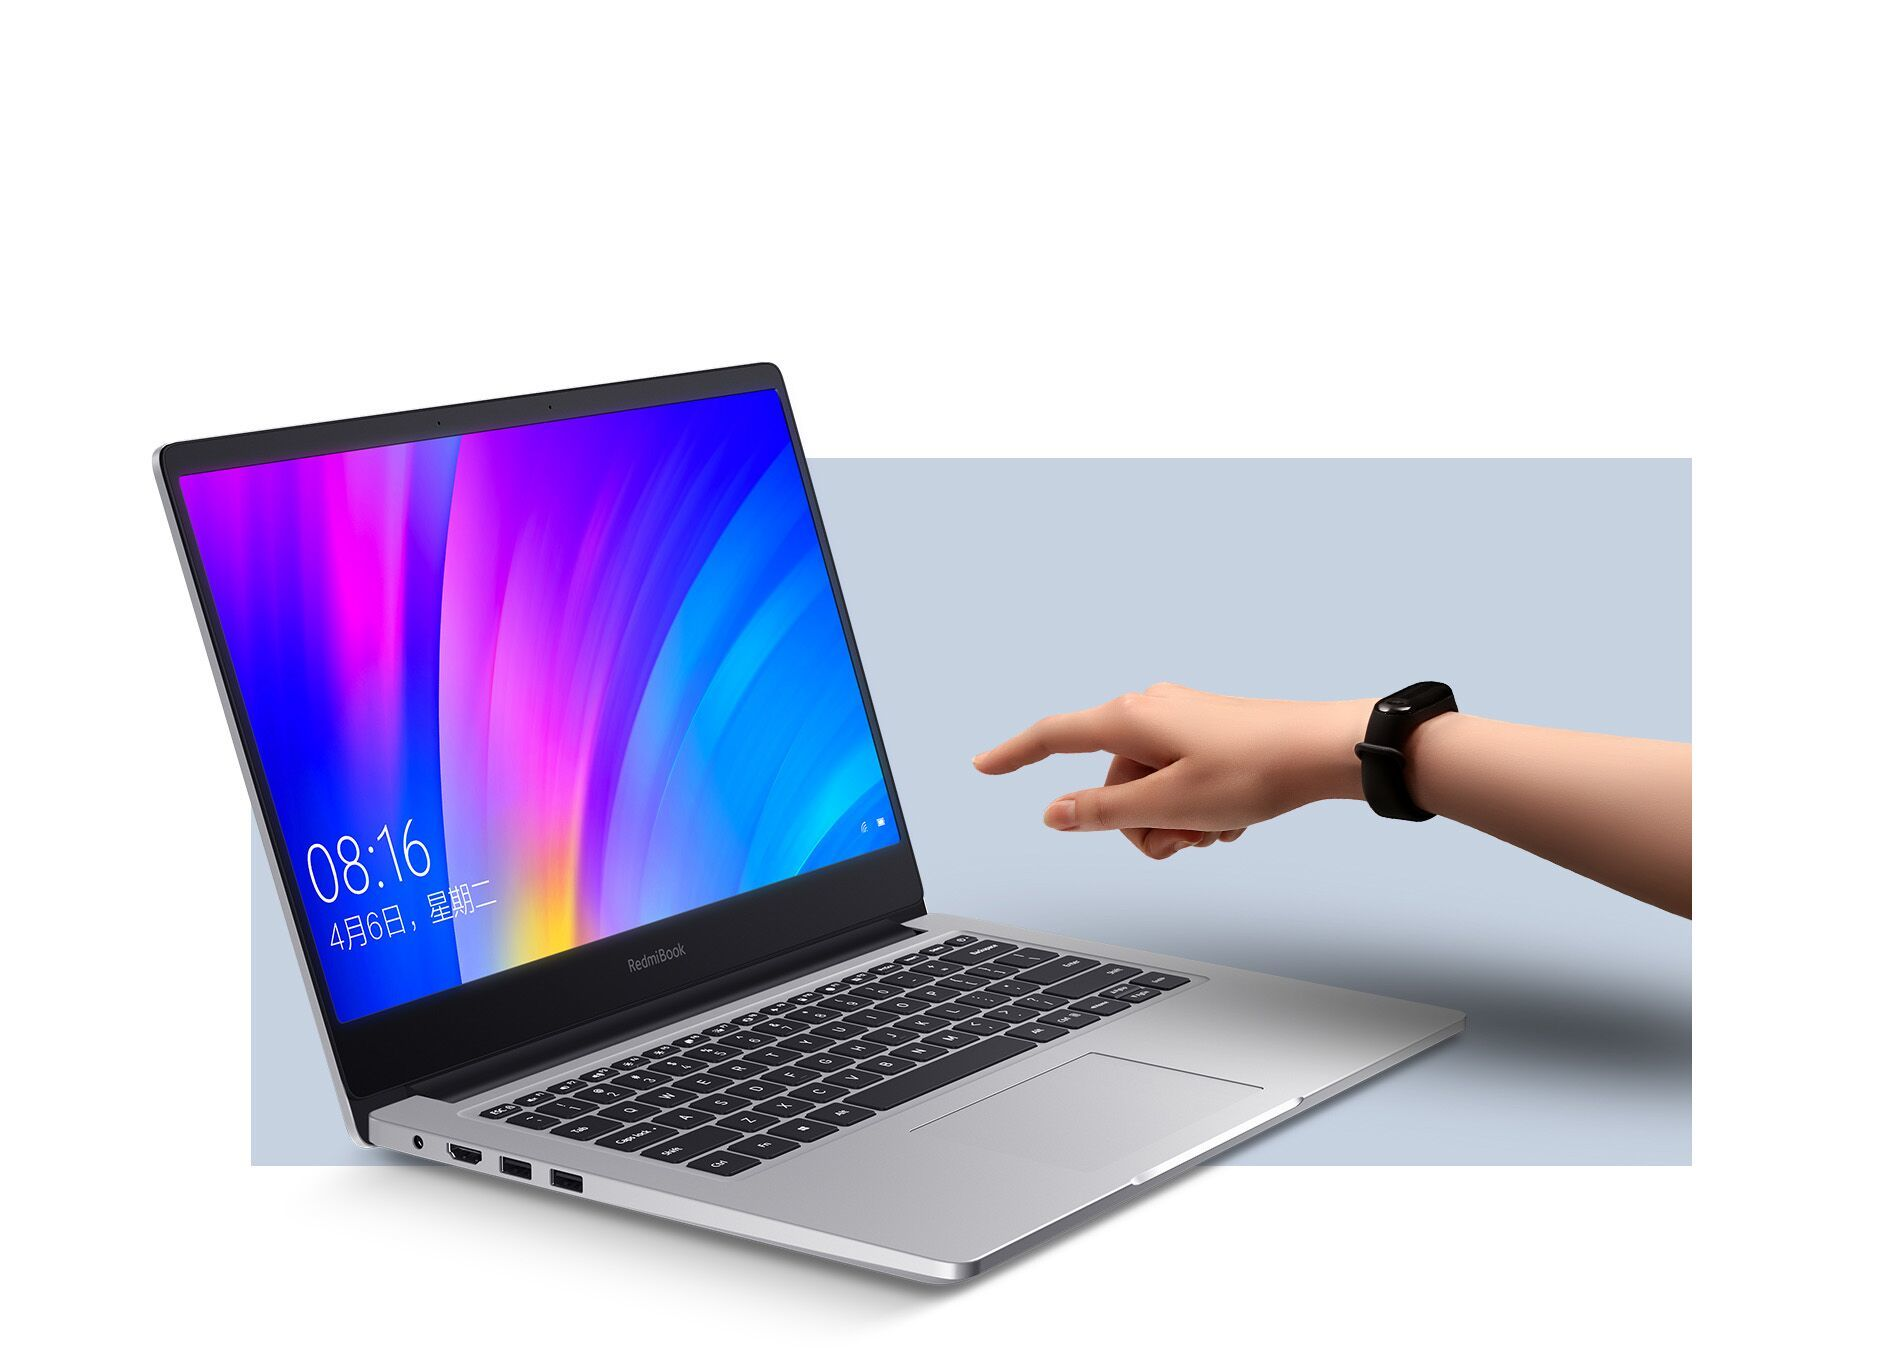 "Redmibook Ноутбук Xiaomi RedmiBook 14"" II (Intel Core i7 1065G7 1300MHz/14""/1920x1080/16GB/512GB SSD/DVD нет/NVIDIA GeForce MX350 2GB/Wi-Fi/Bluetooth/Windows 10 Home) silver 14RedmiBook8.jpg"